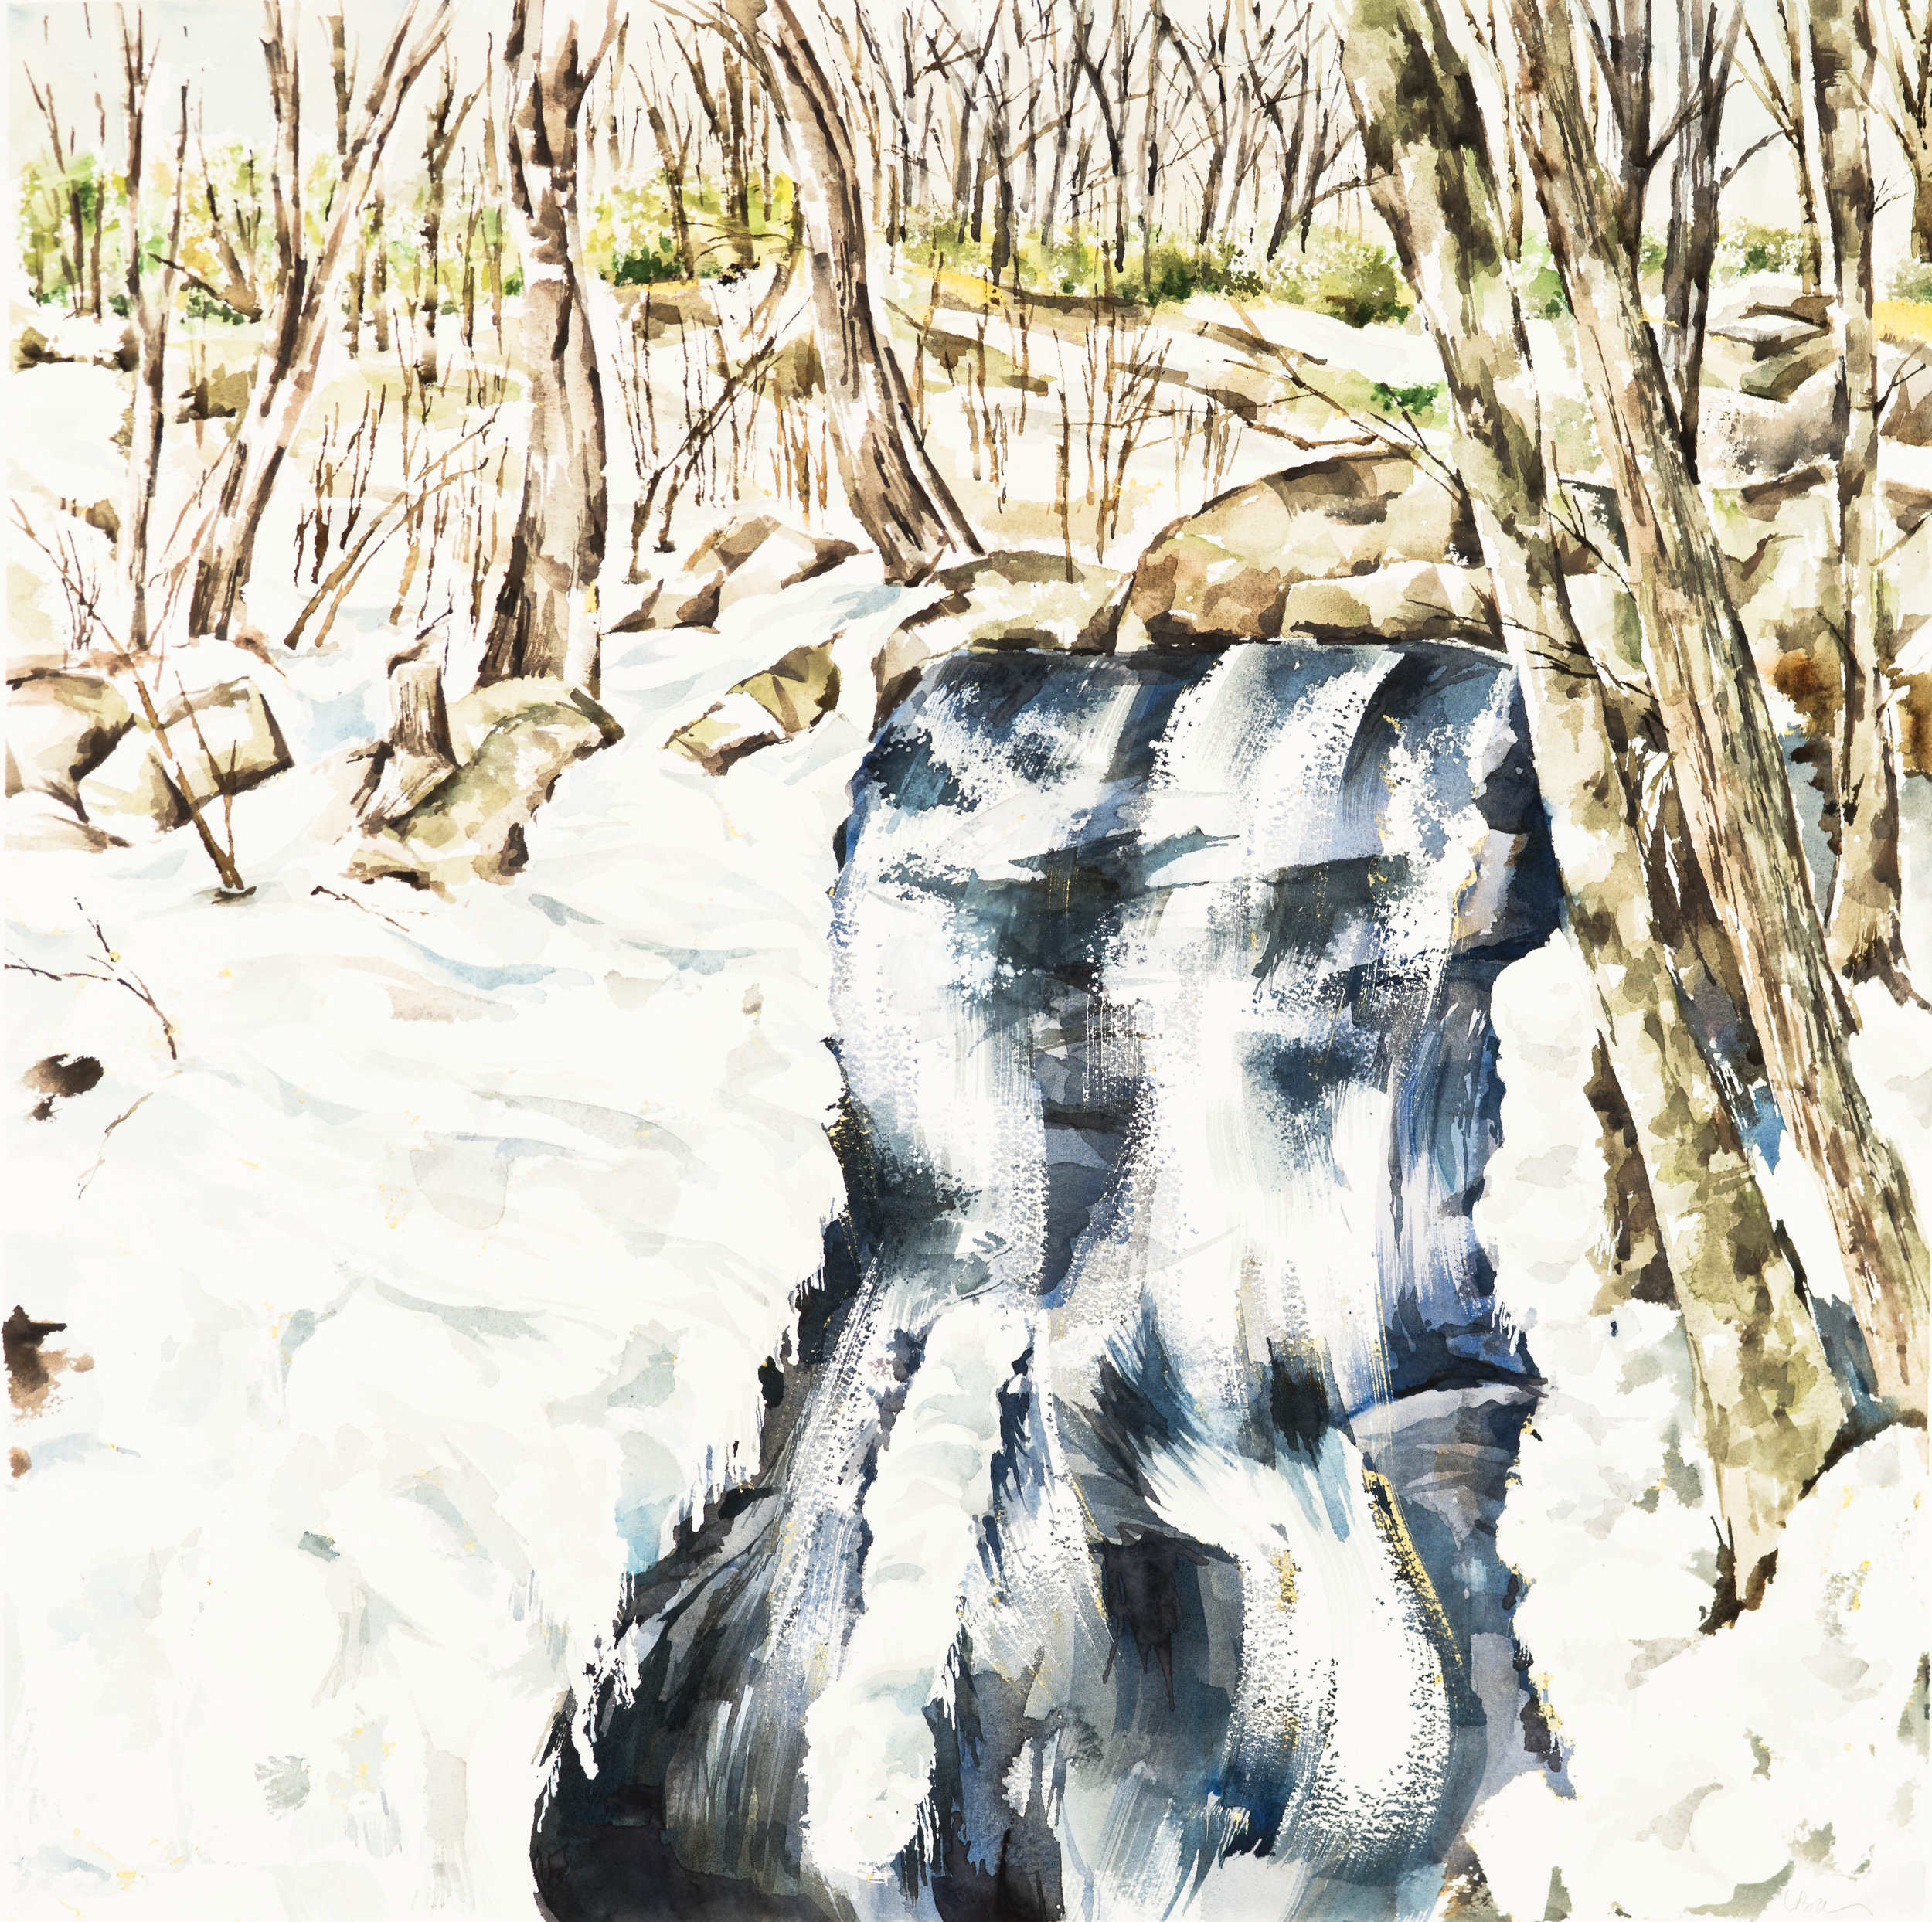 Crabtree Falls 20.5 x 20.5 Watercolor